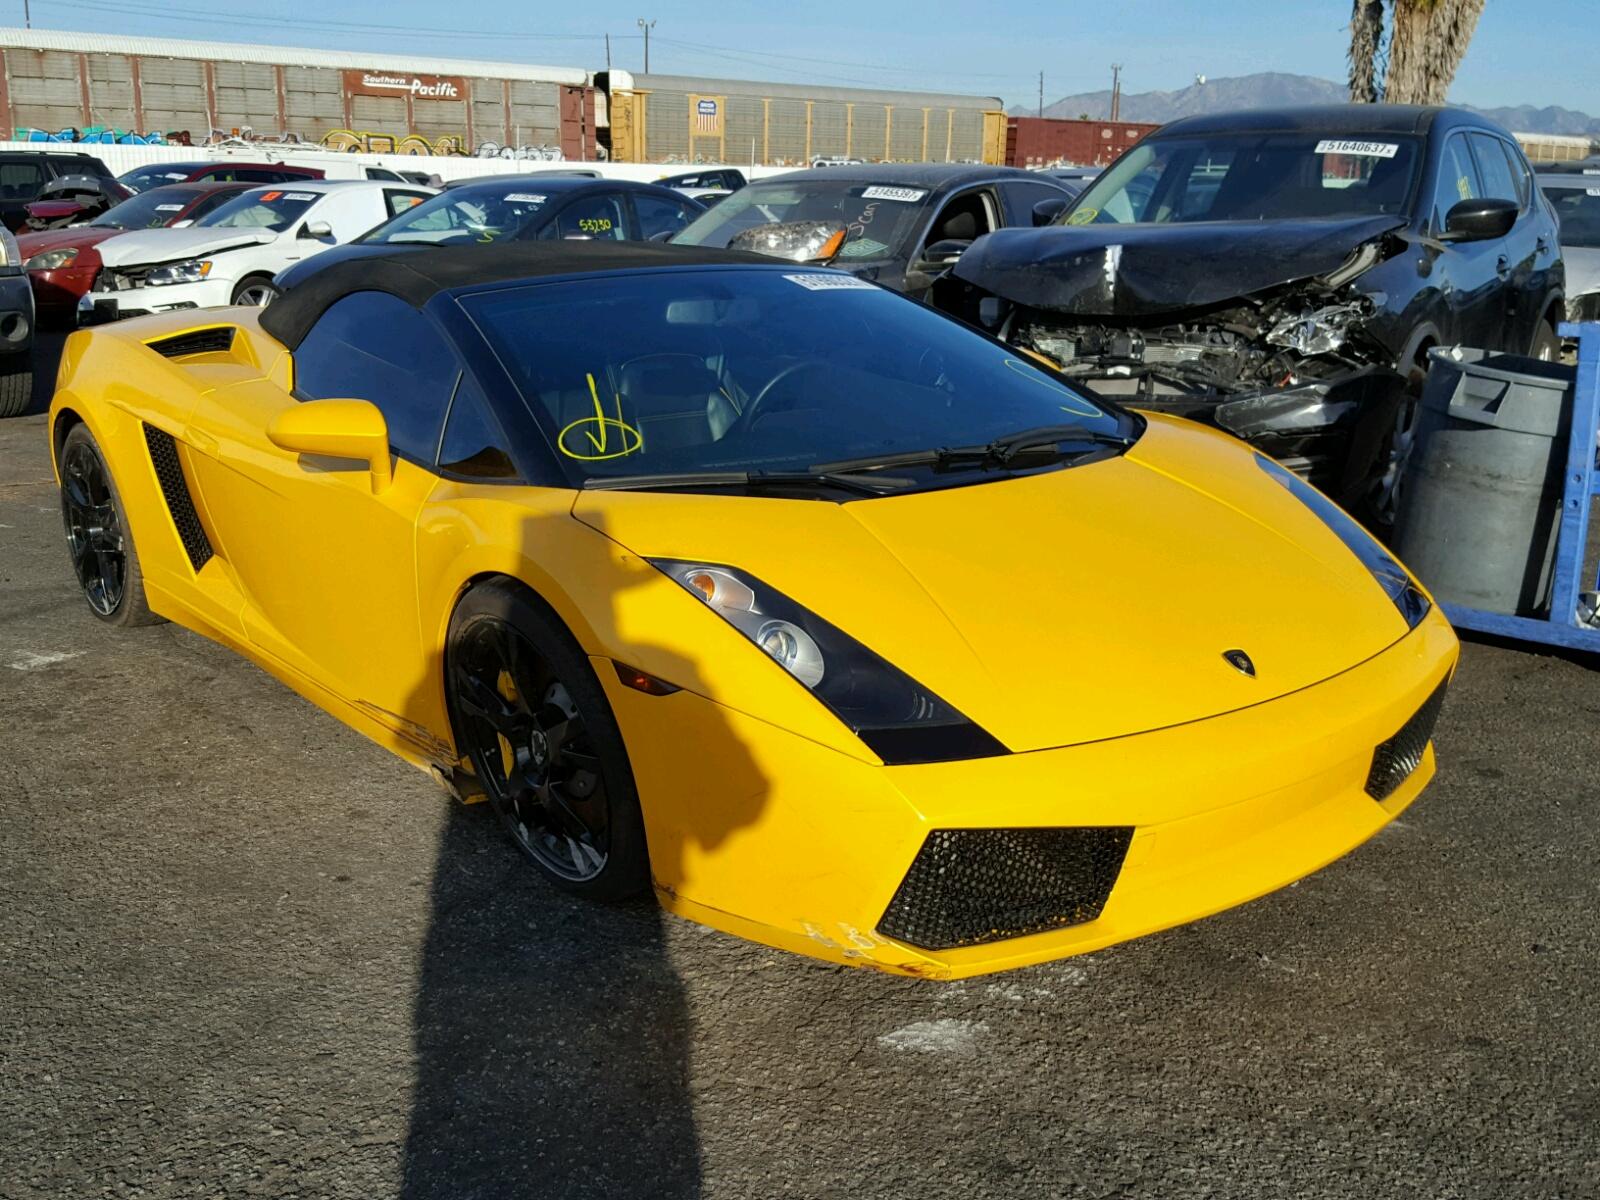 2006 Lamborghini Gallardo S For Sale At Copart Van Nuys